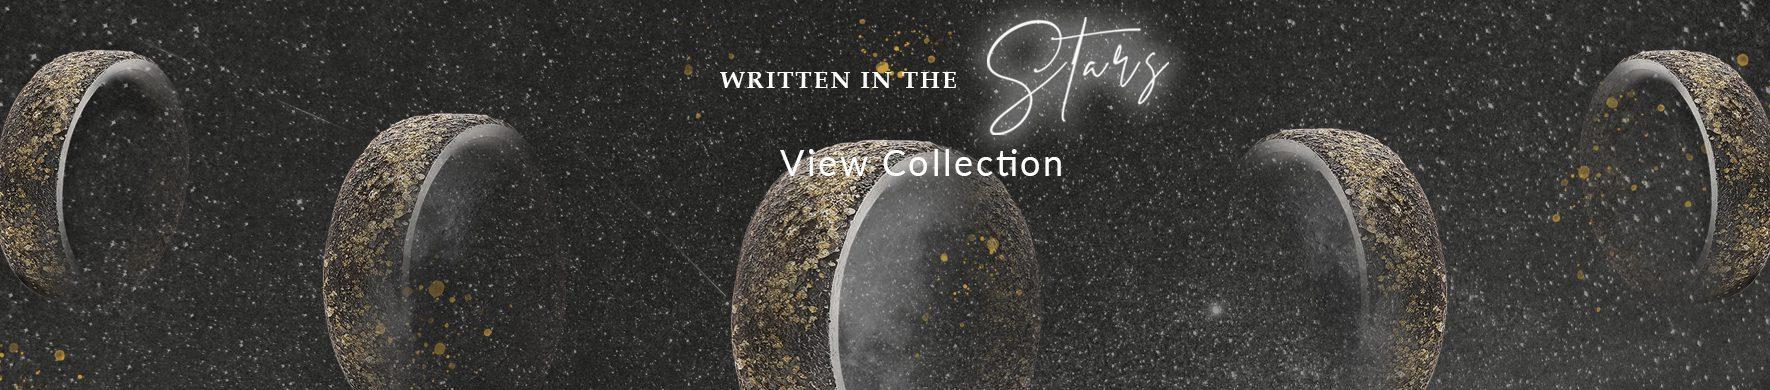 written-in-the-stars-homepage